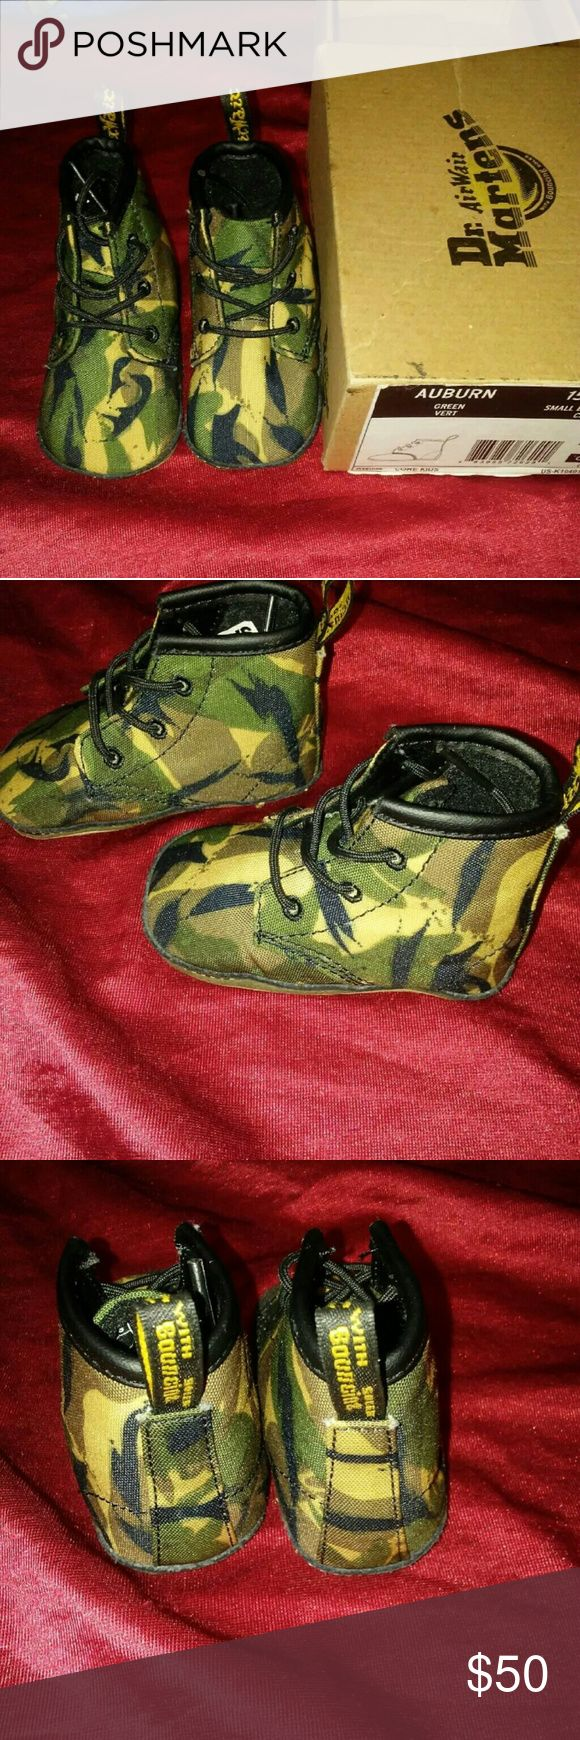 Baby Dr Martens size 3 Baby Dr Martens size 3 Dr. Martens Shoes Boots